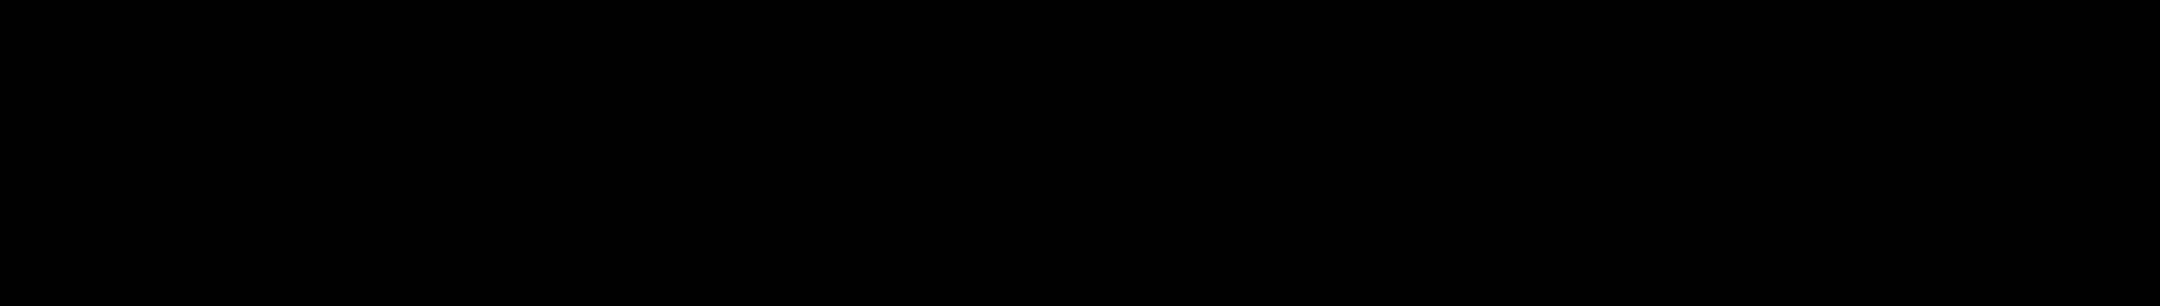 blackrock logo 1 - BlackRock Logo